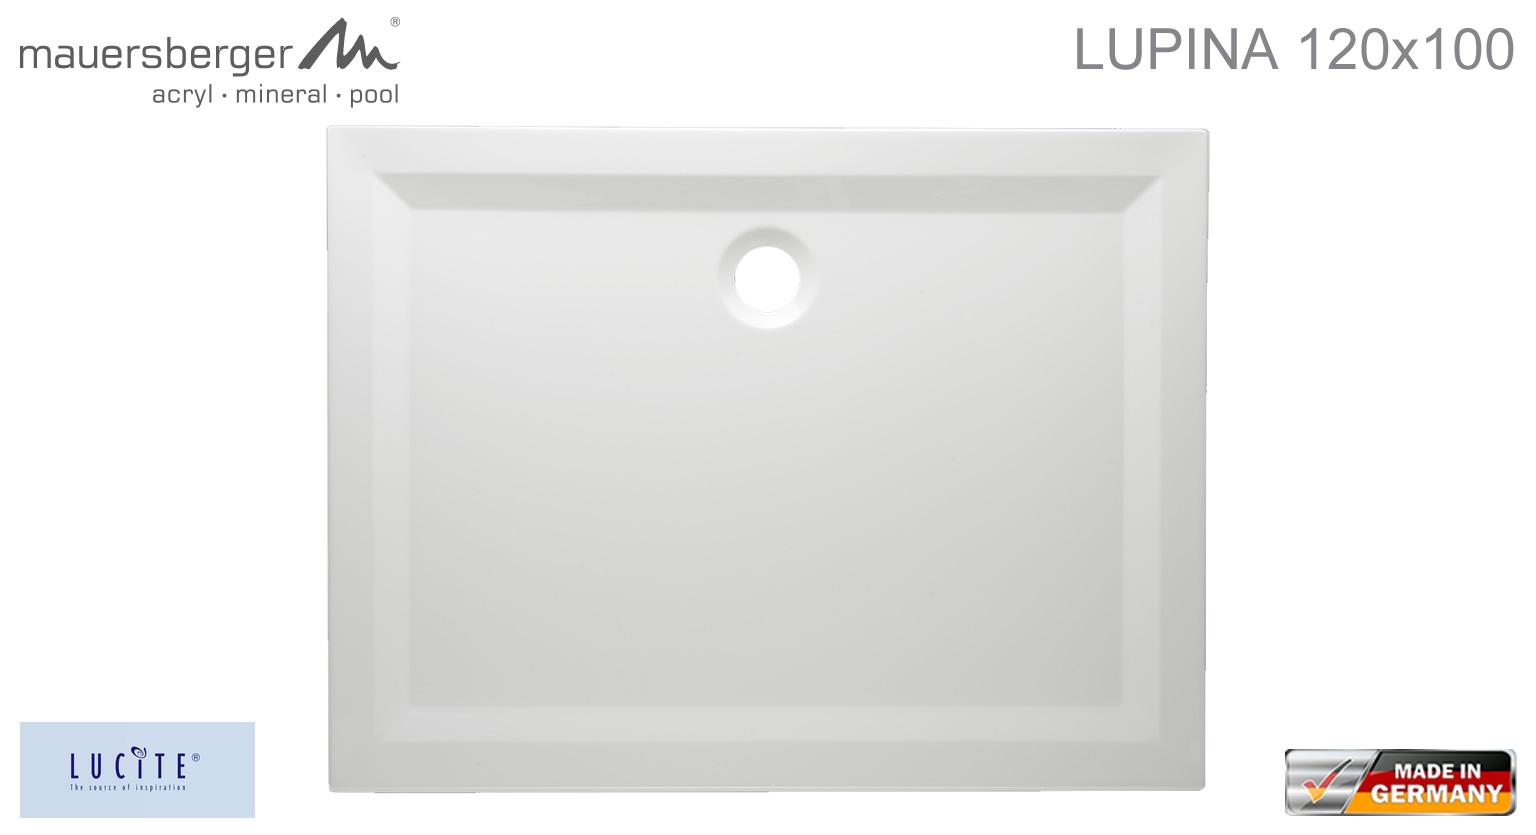 mauersberger duschwanne lupina 120 x 100 cm superflach. Black Bedroom Furniture Sets. Home Design Ideas